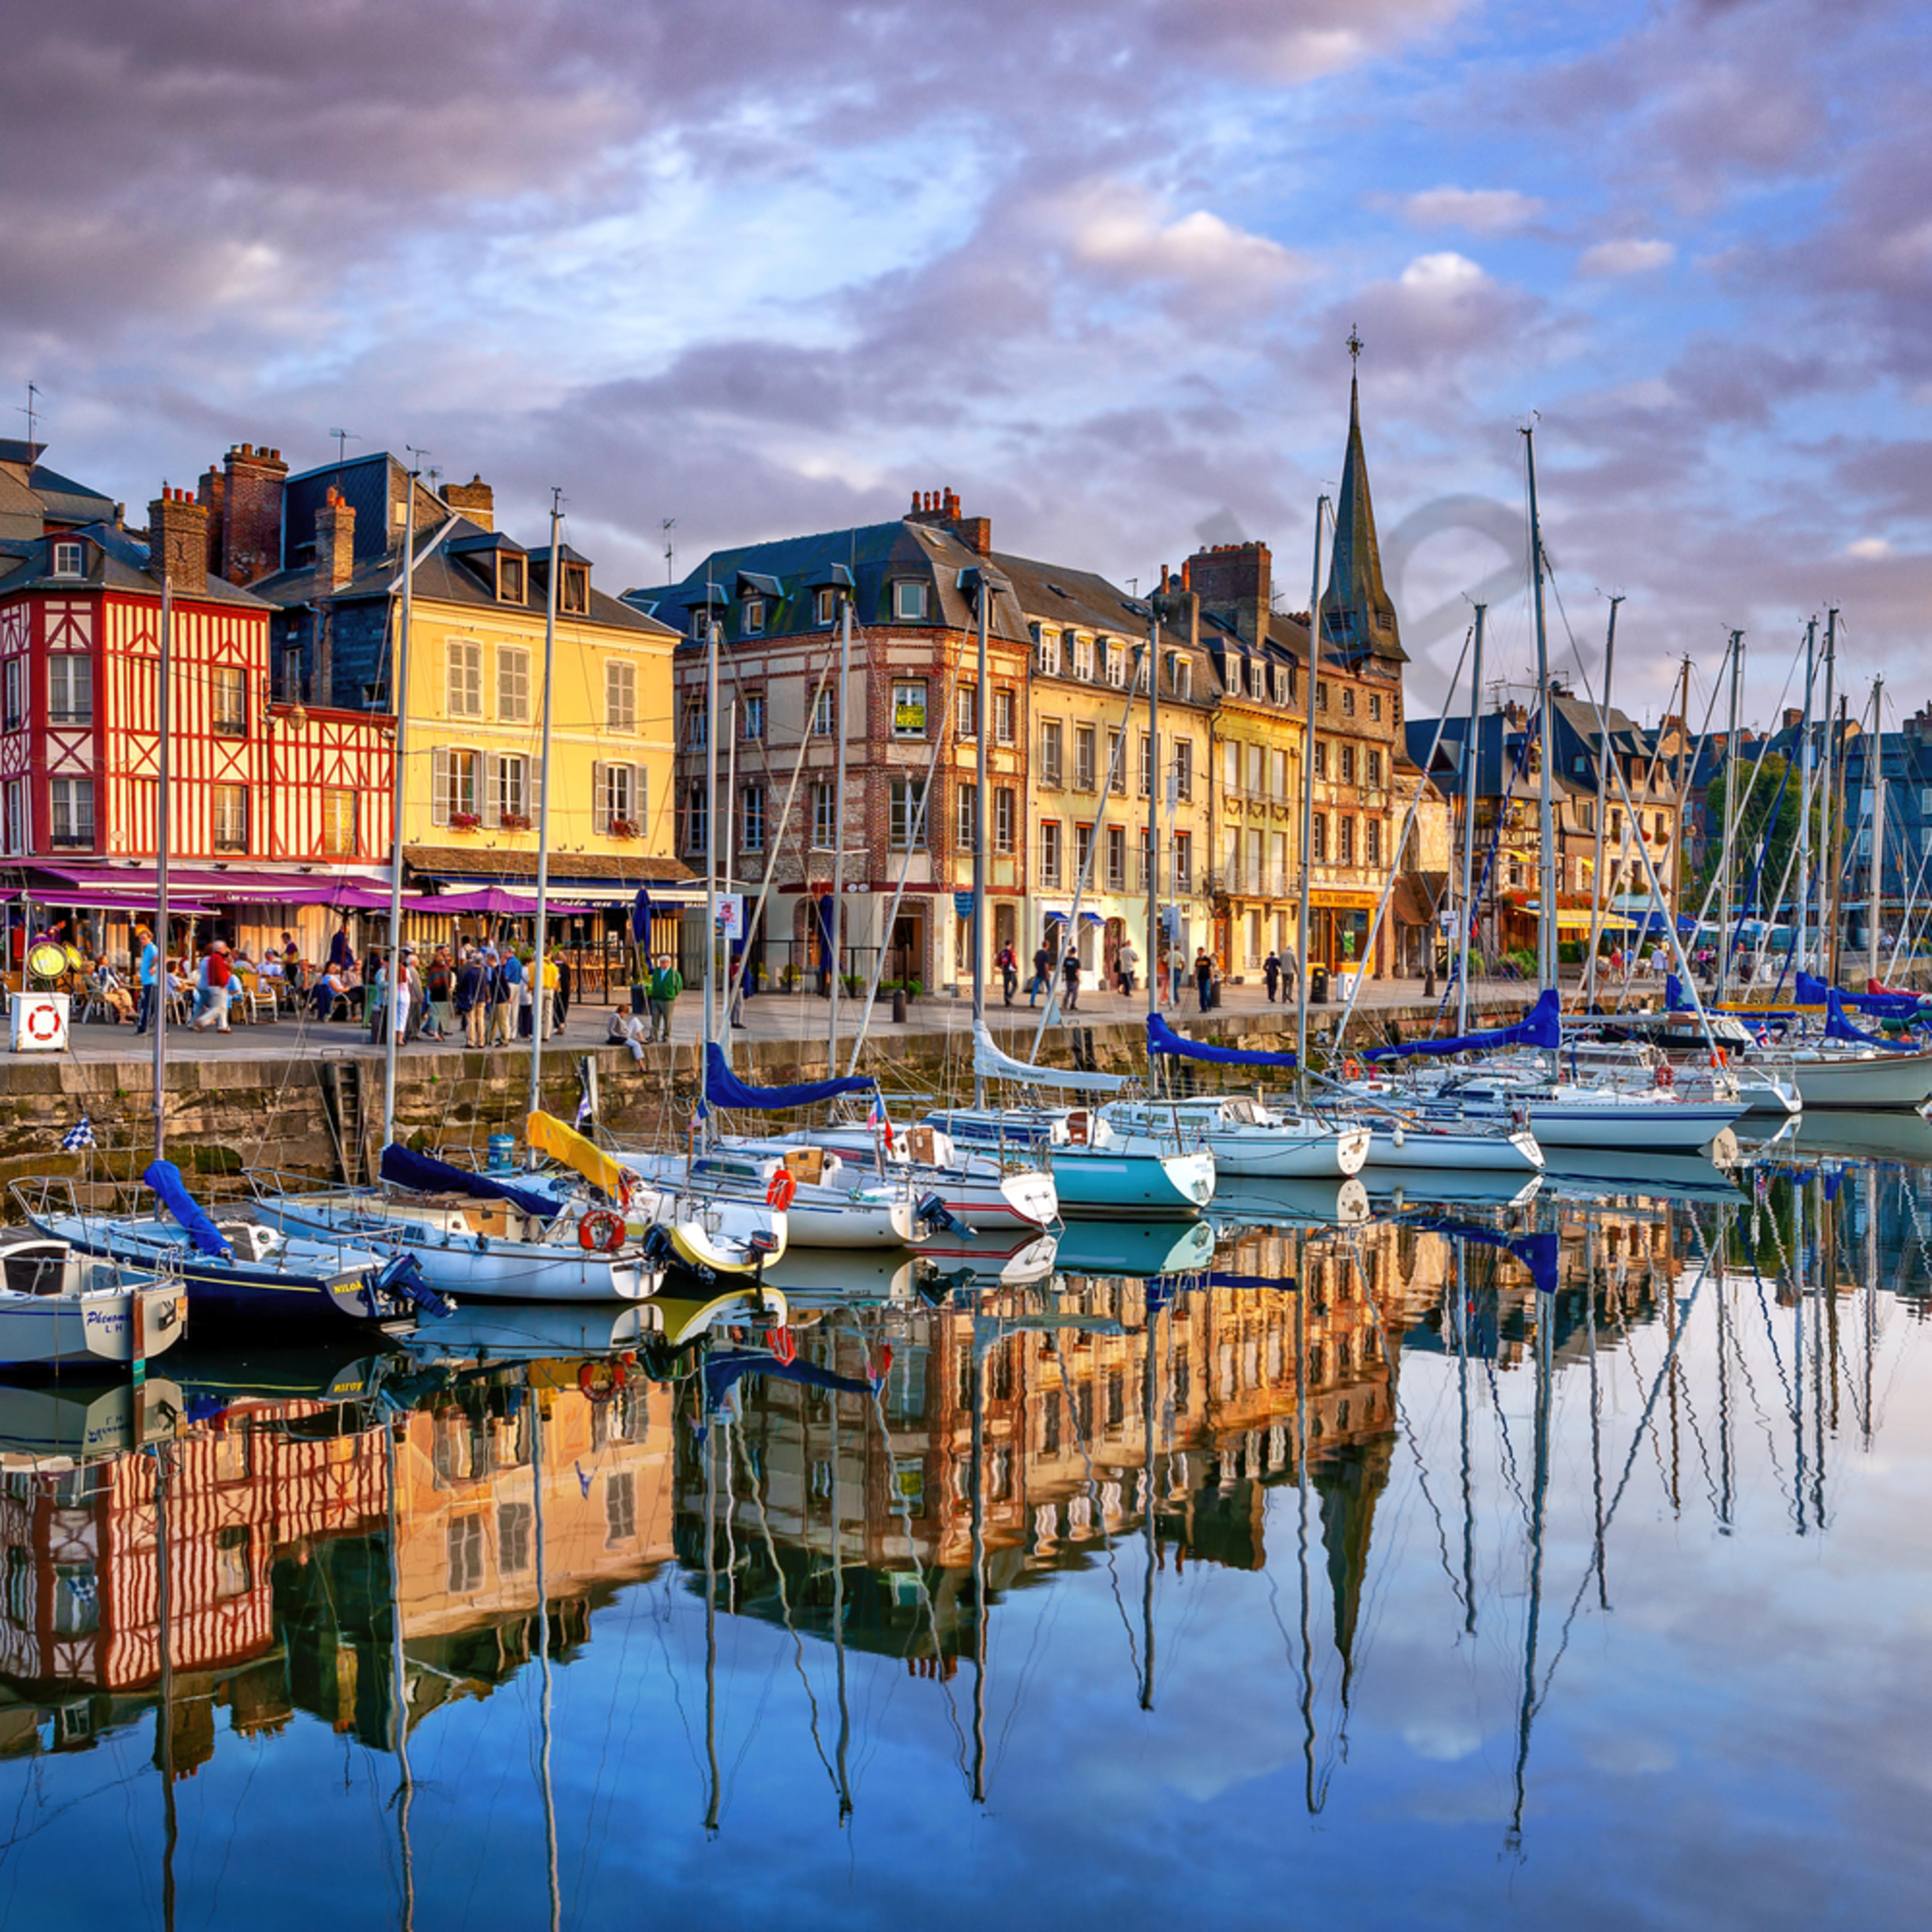 Honfleur normandy france by main harbor em5pgx